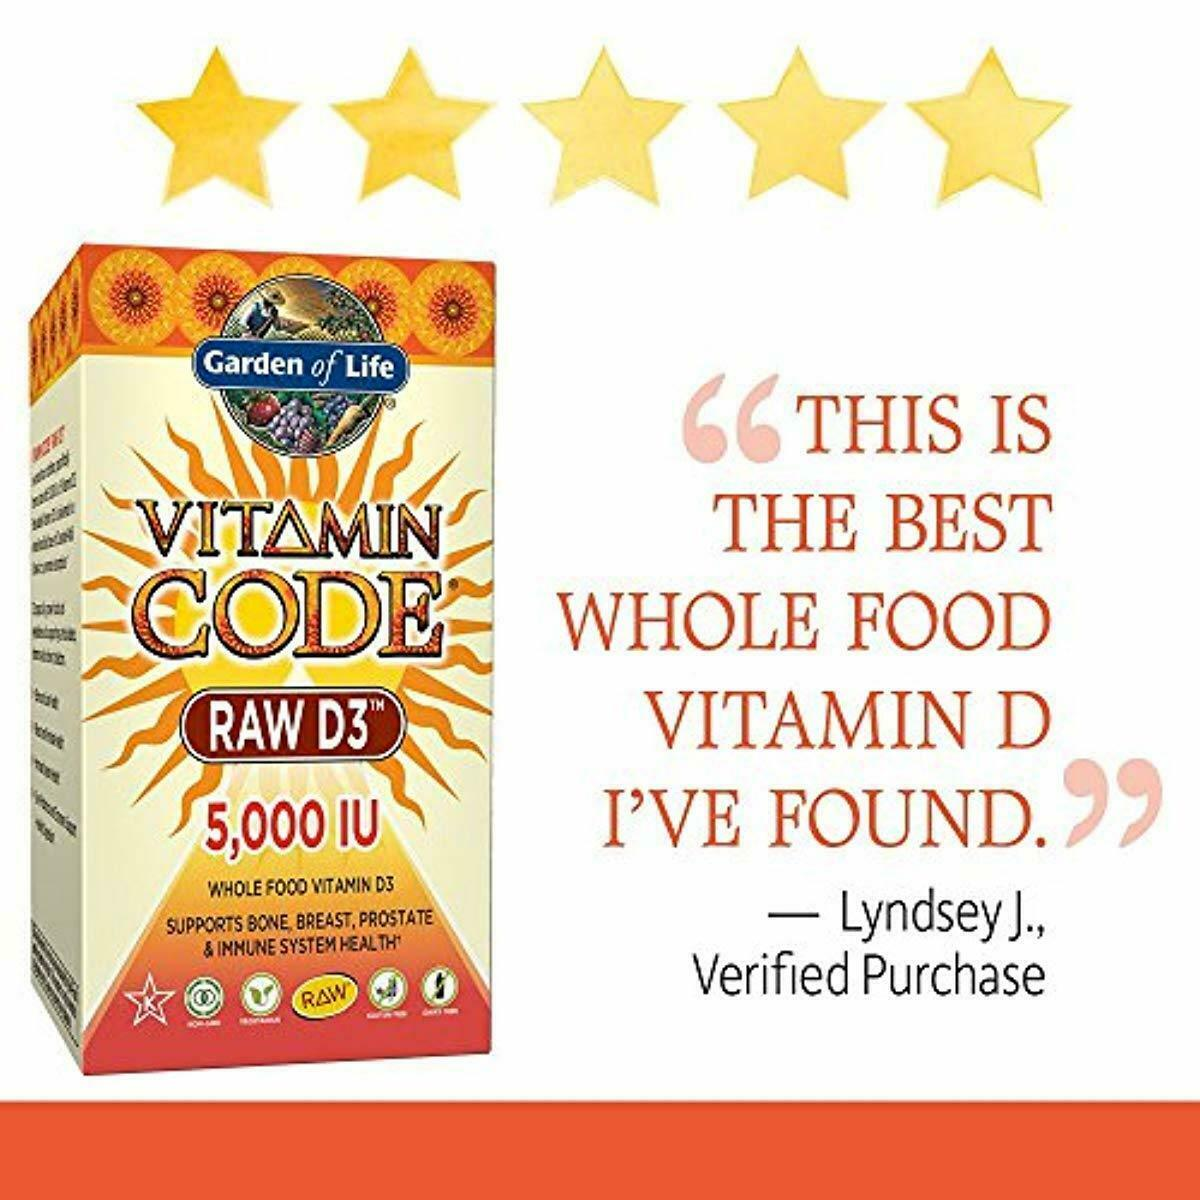 Garden of Life Raw D3 5000 IU Supplement Vitamin Code Whole